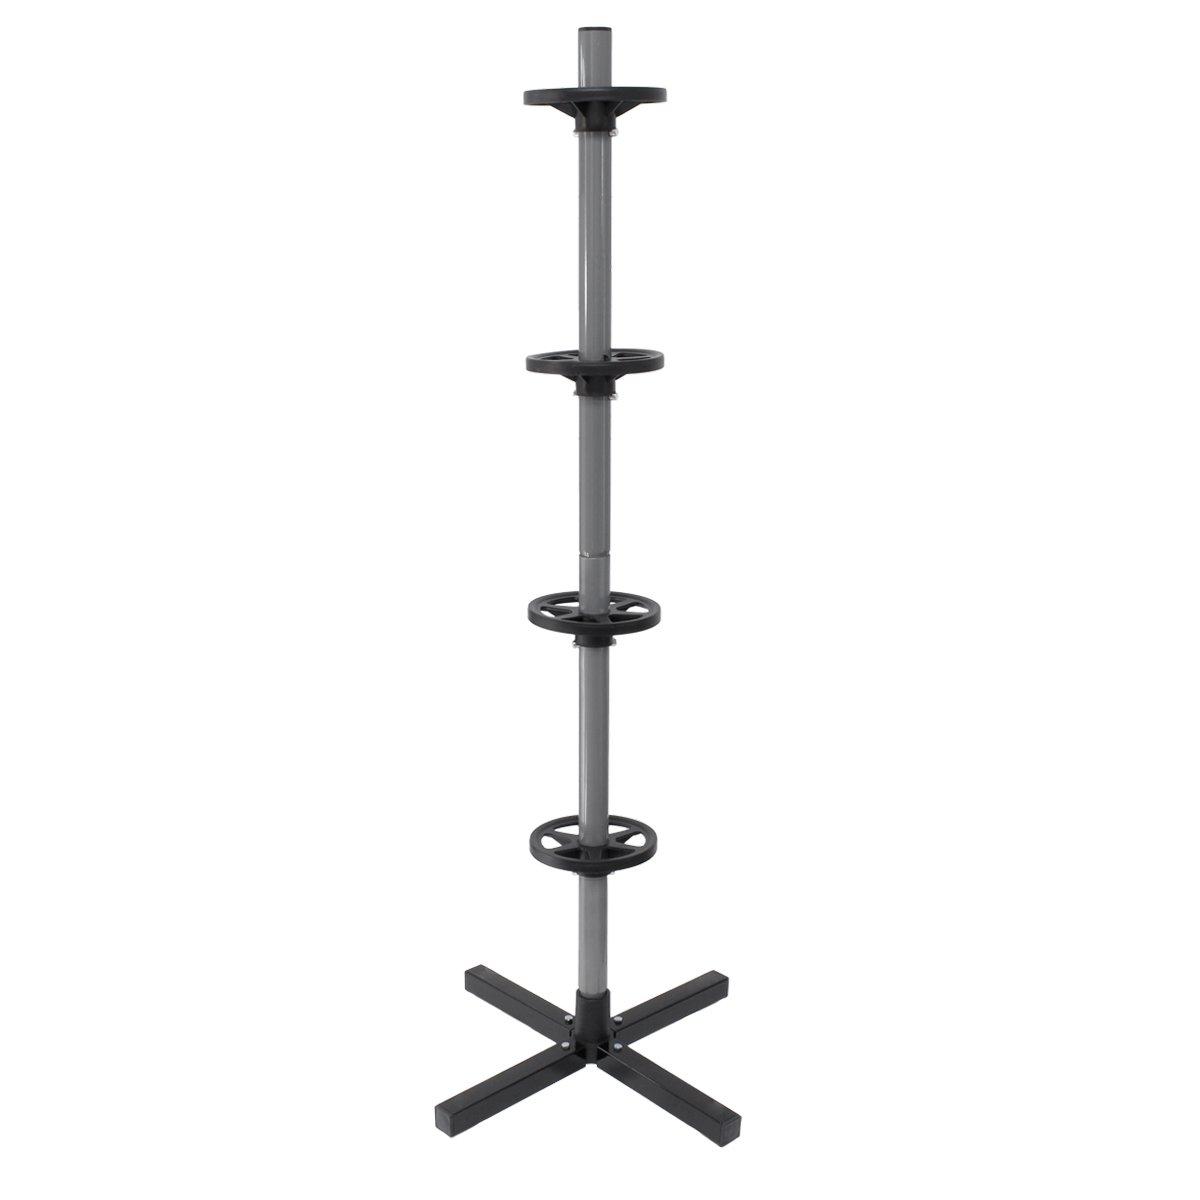 ECD Germany Soporte para llanta en Forma de á rbol para un Ancho de hasta 295 mm 45 x 45 x 143.5 cm para Carga 4 neumá ticos Carga má xima de 100kg